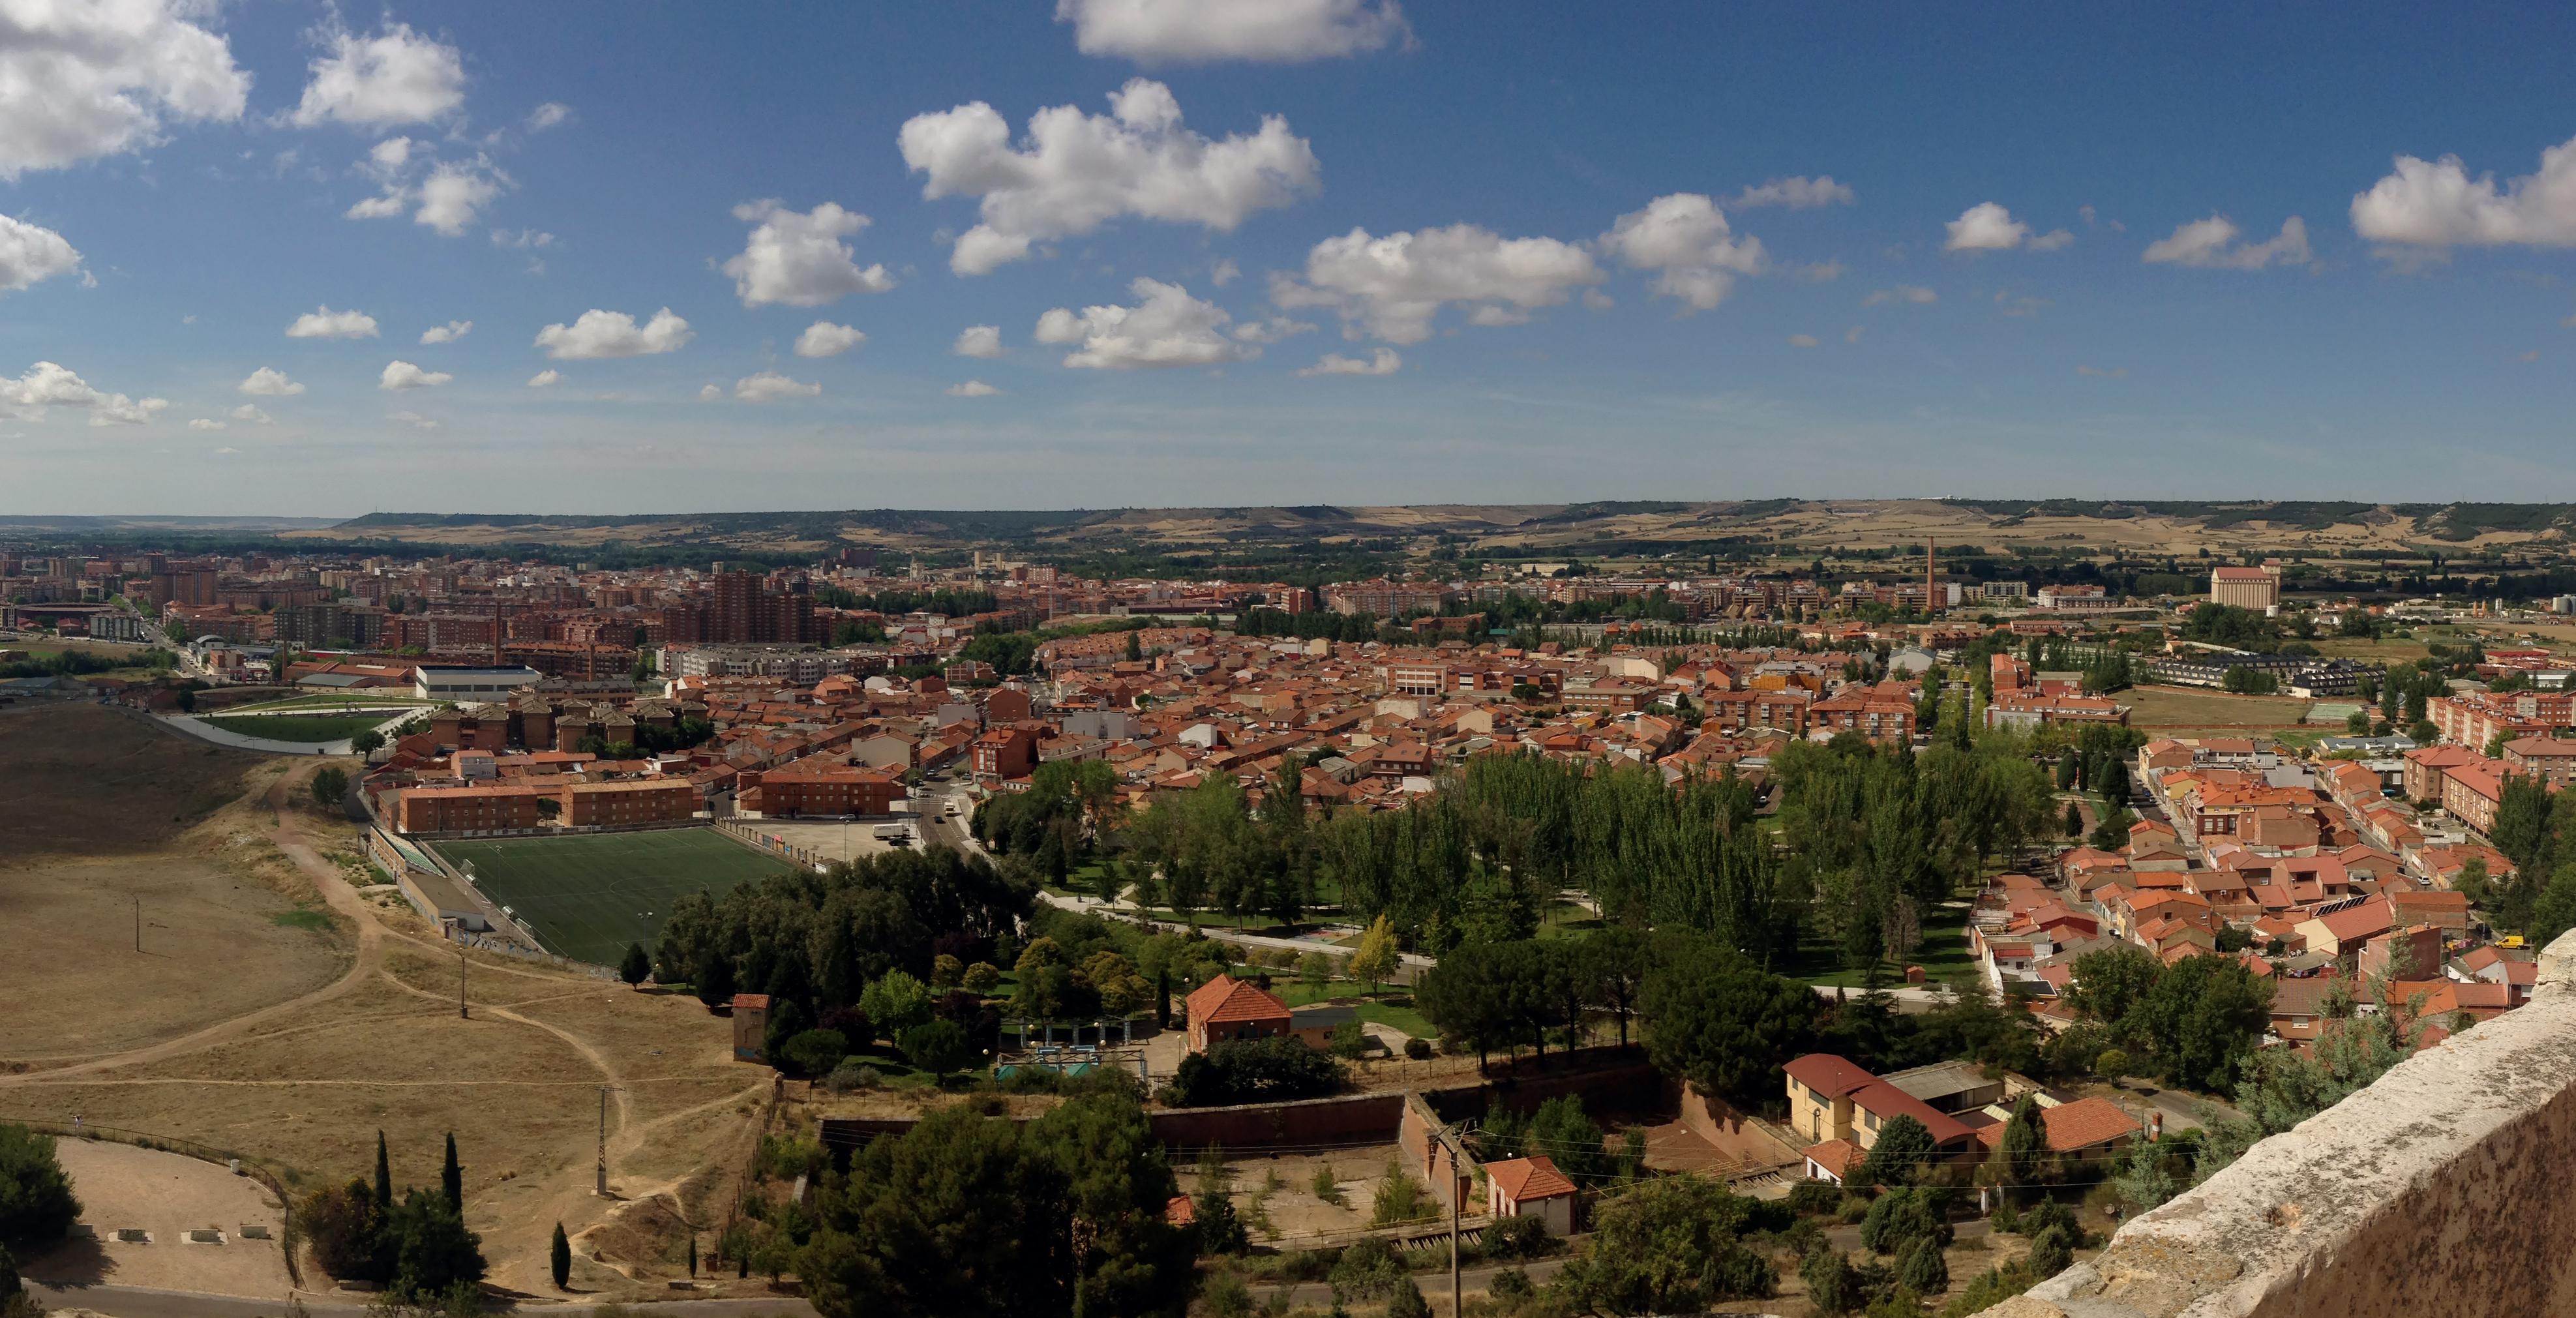 File:Palencia - panoramio (cropped).jpg - Wikimedia Commons